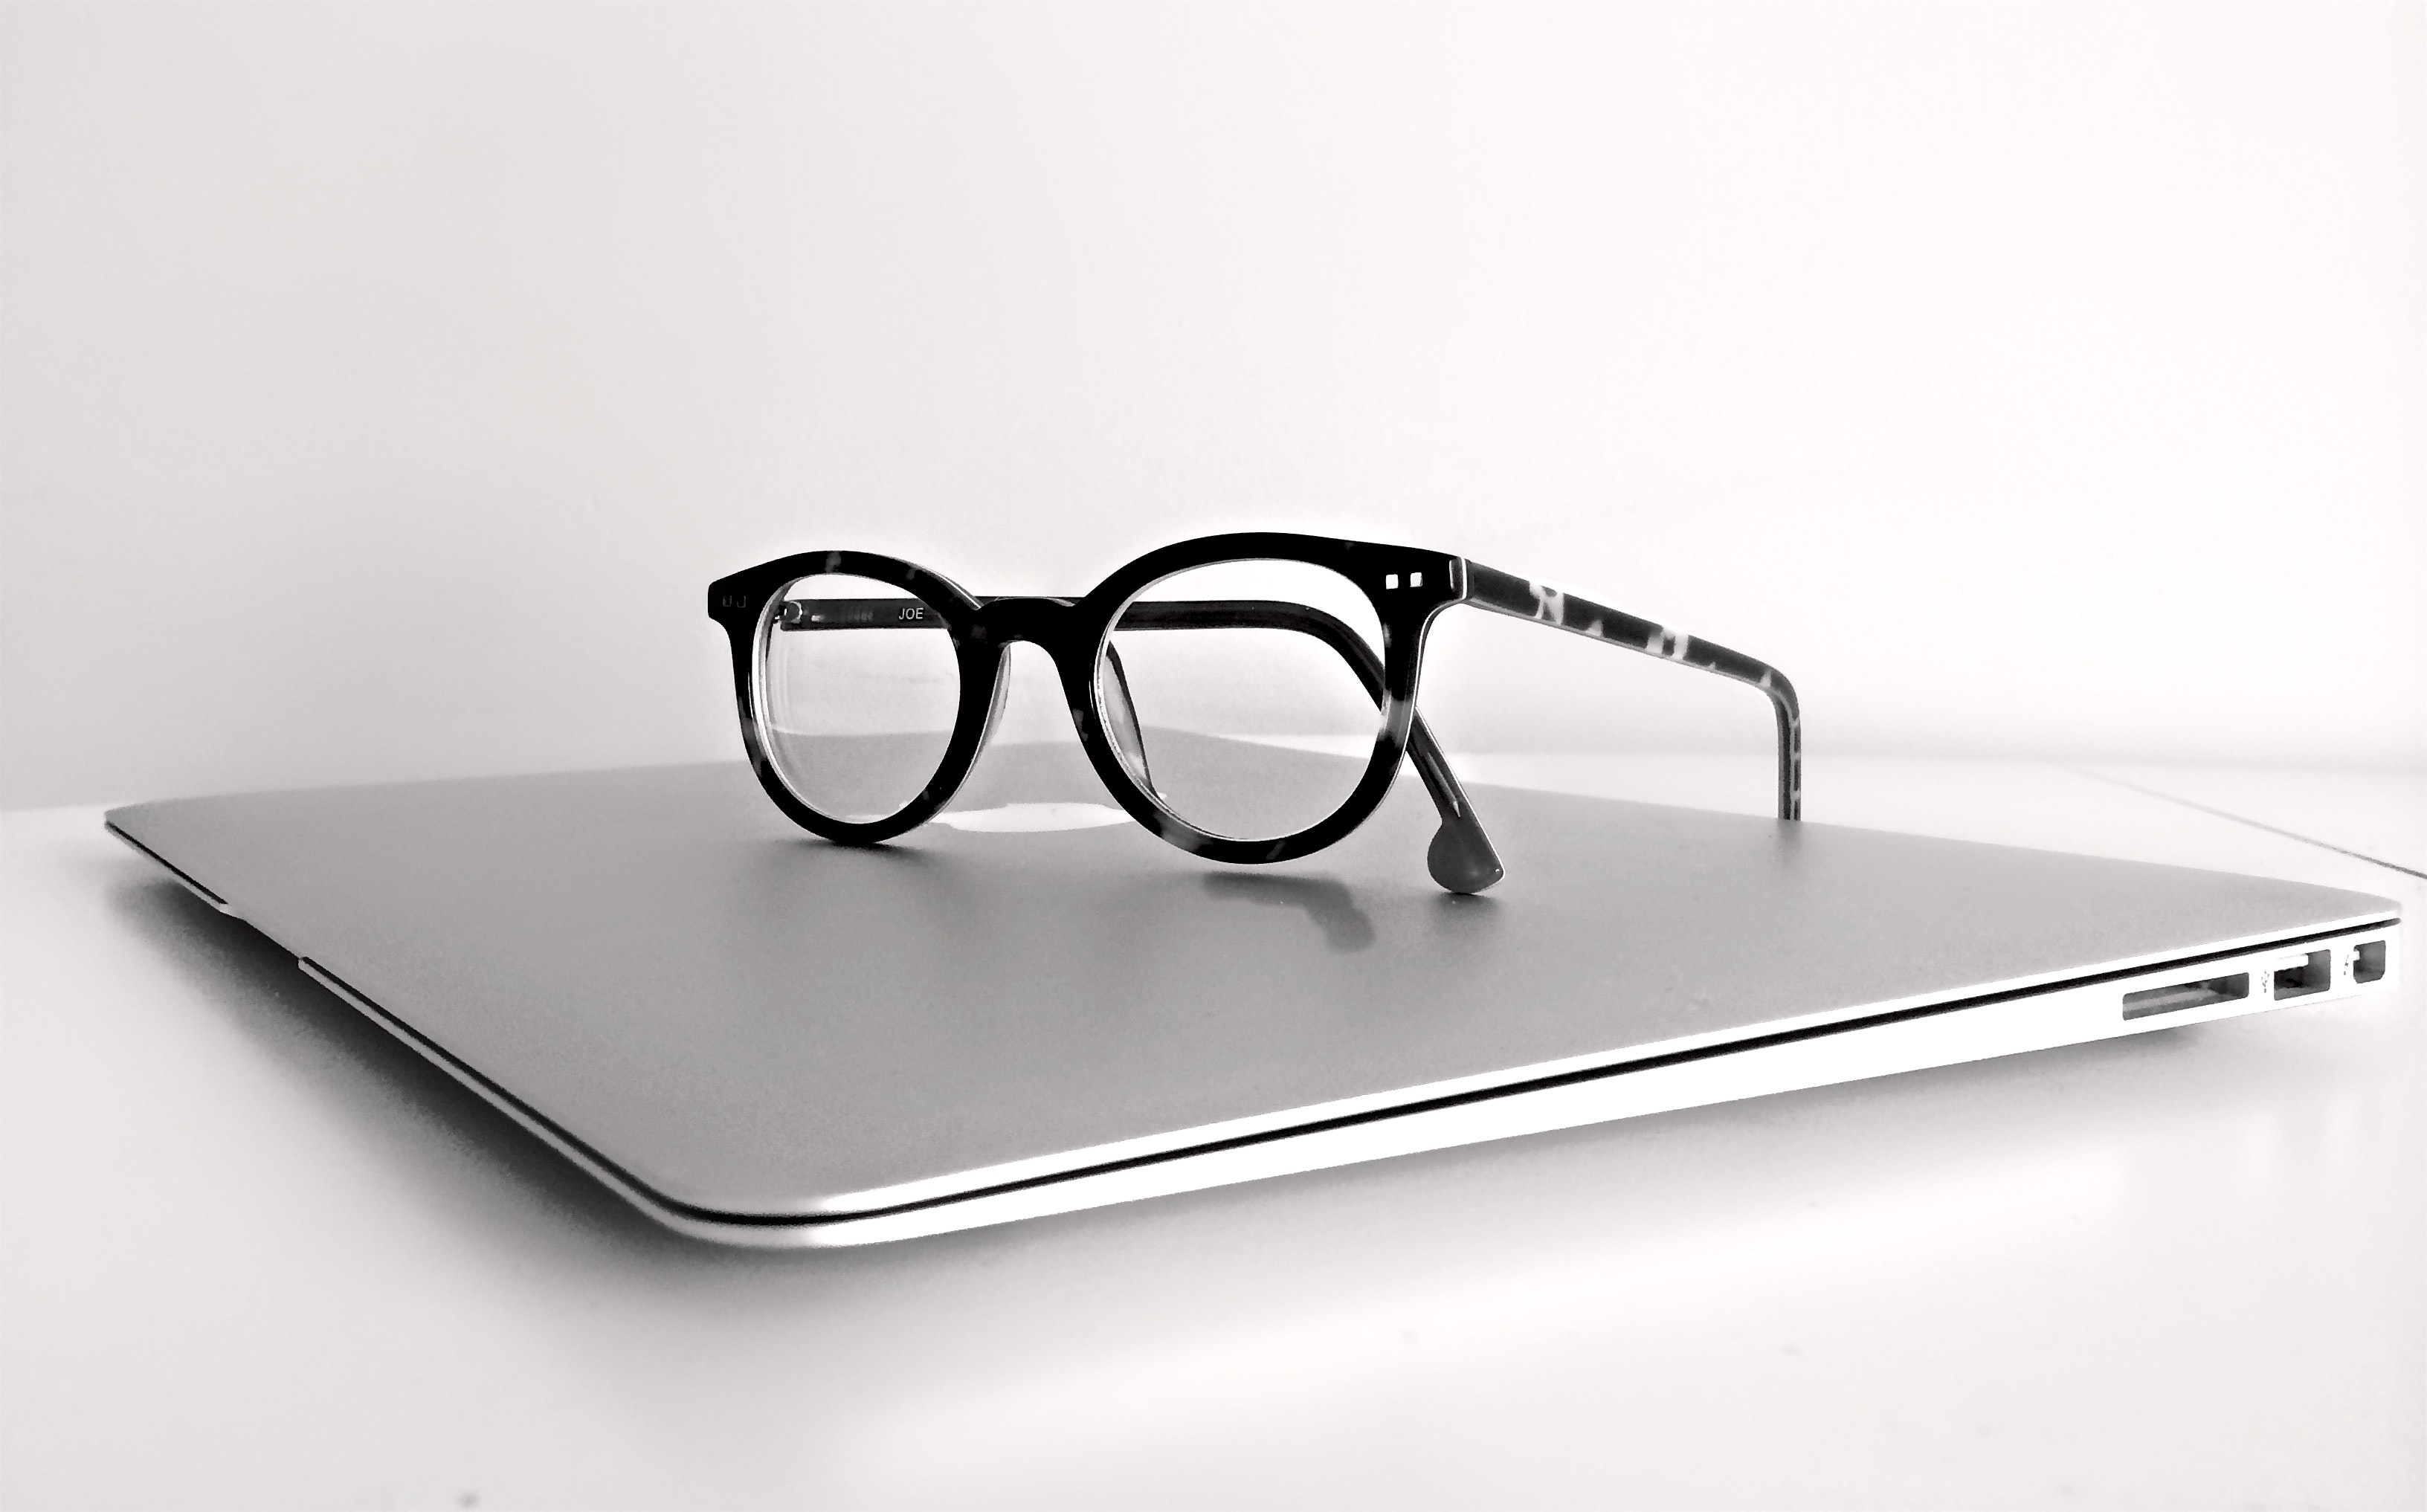 023ce30199 Black Frame Eyeglasses on Silver Macbook Air · Free Stock Photo